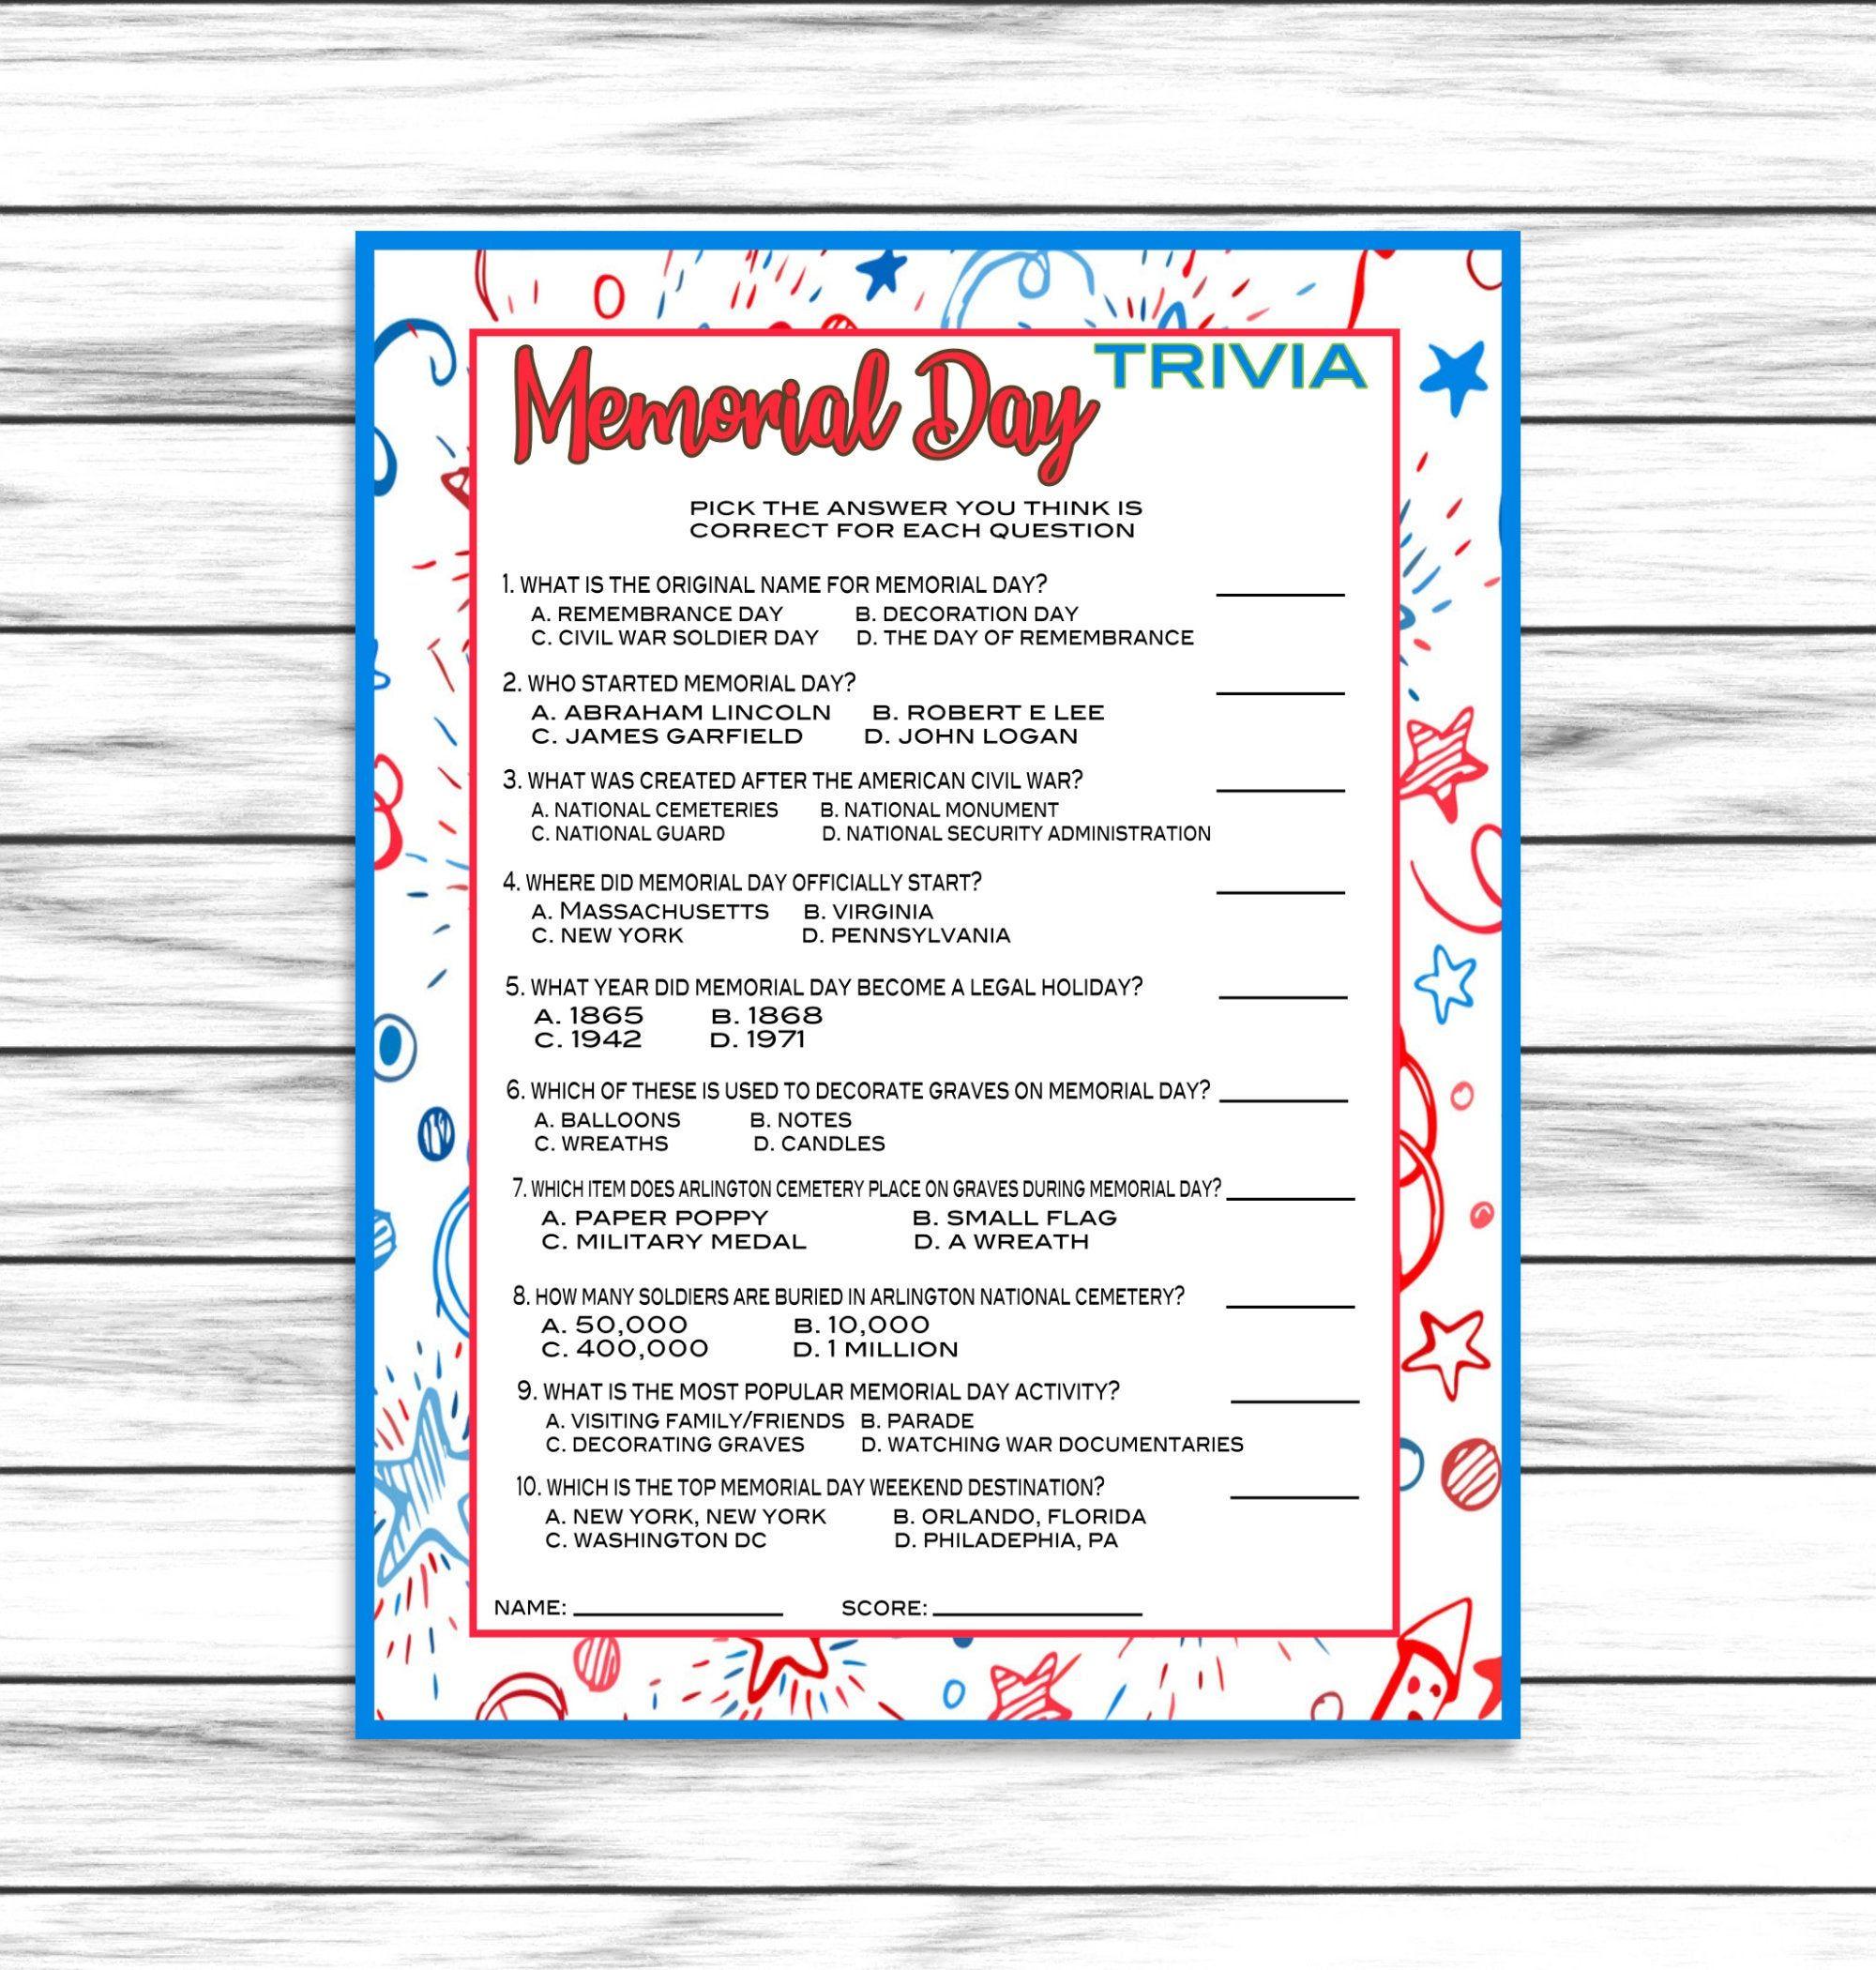 Memorial Day Trivia Game Party Game Memorial Day Party Game Memorial Day Printable Game Memorial Day Decor Ins Memorial Day Trivia Memorial Day Activities [ 2100 x 2000 Pixel ]